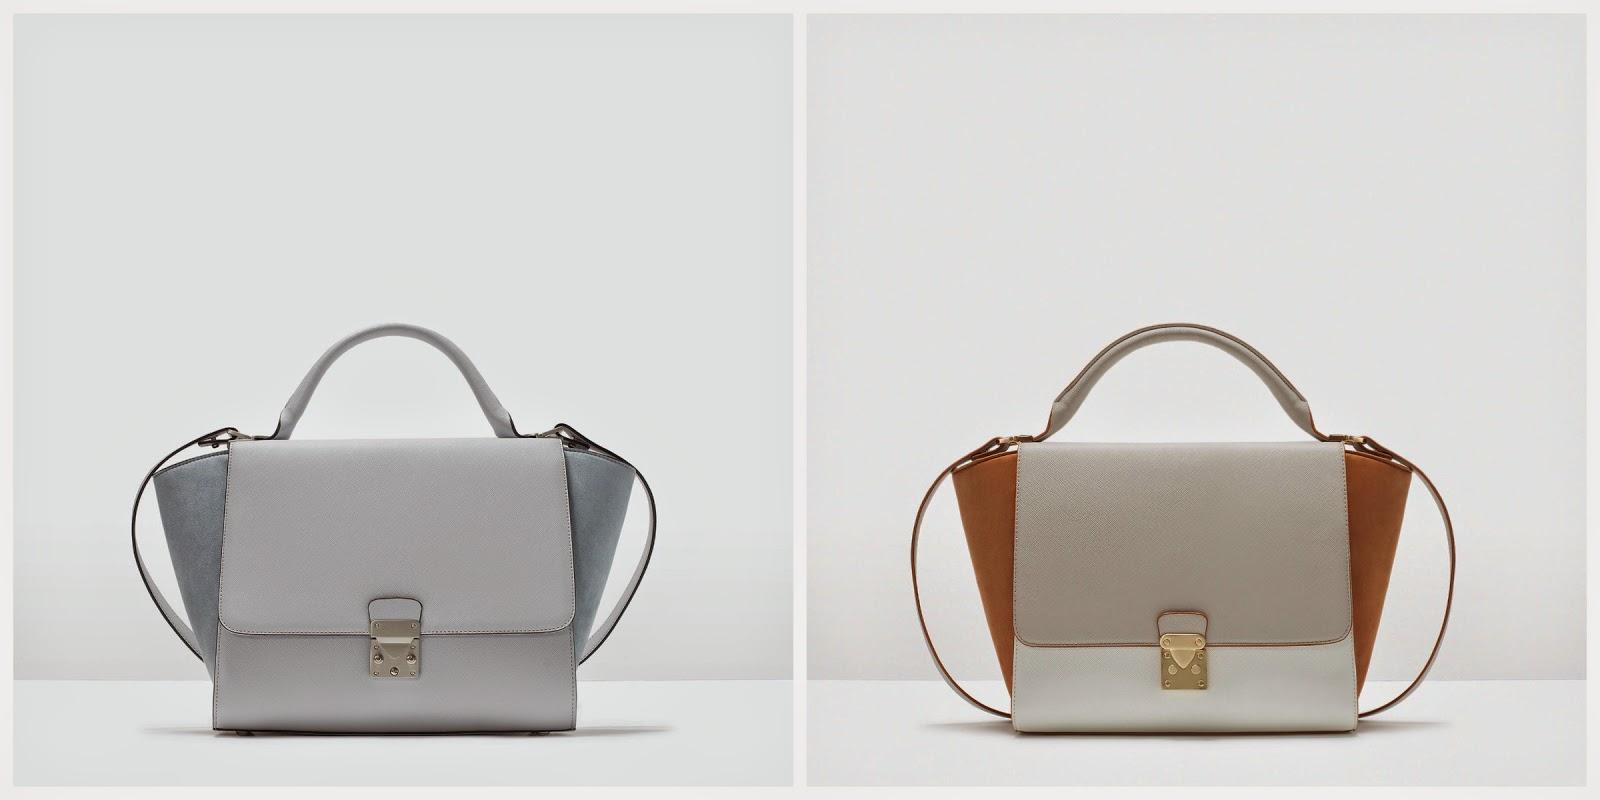 Zara clona el bolso Trapeze de Céline. Bolso Tricolor Celine. Céline Tricolor Trapeze